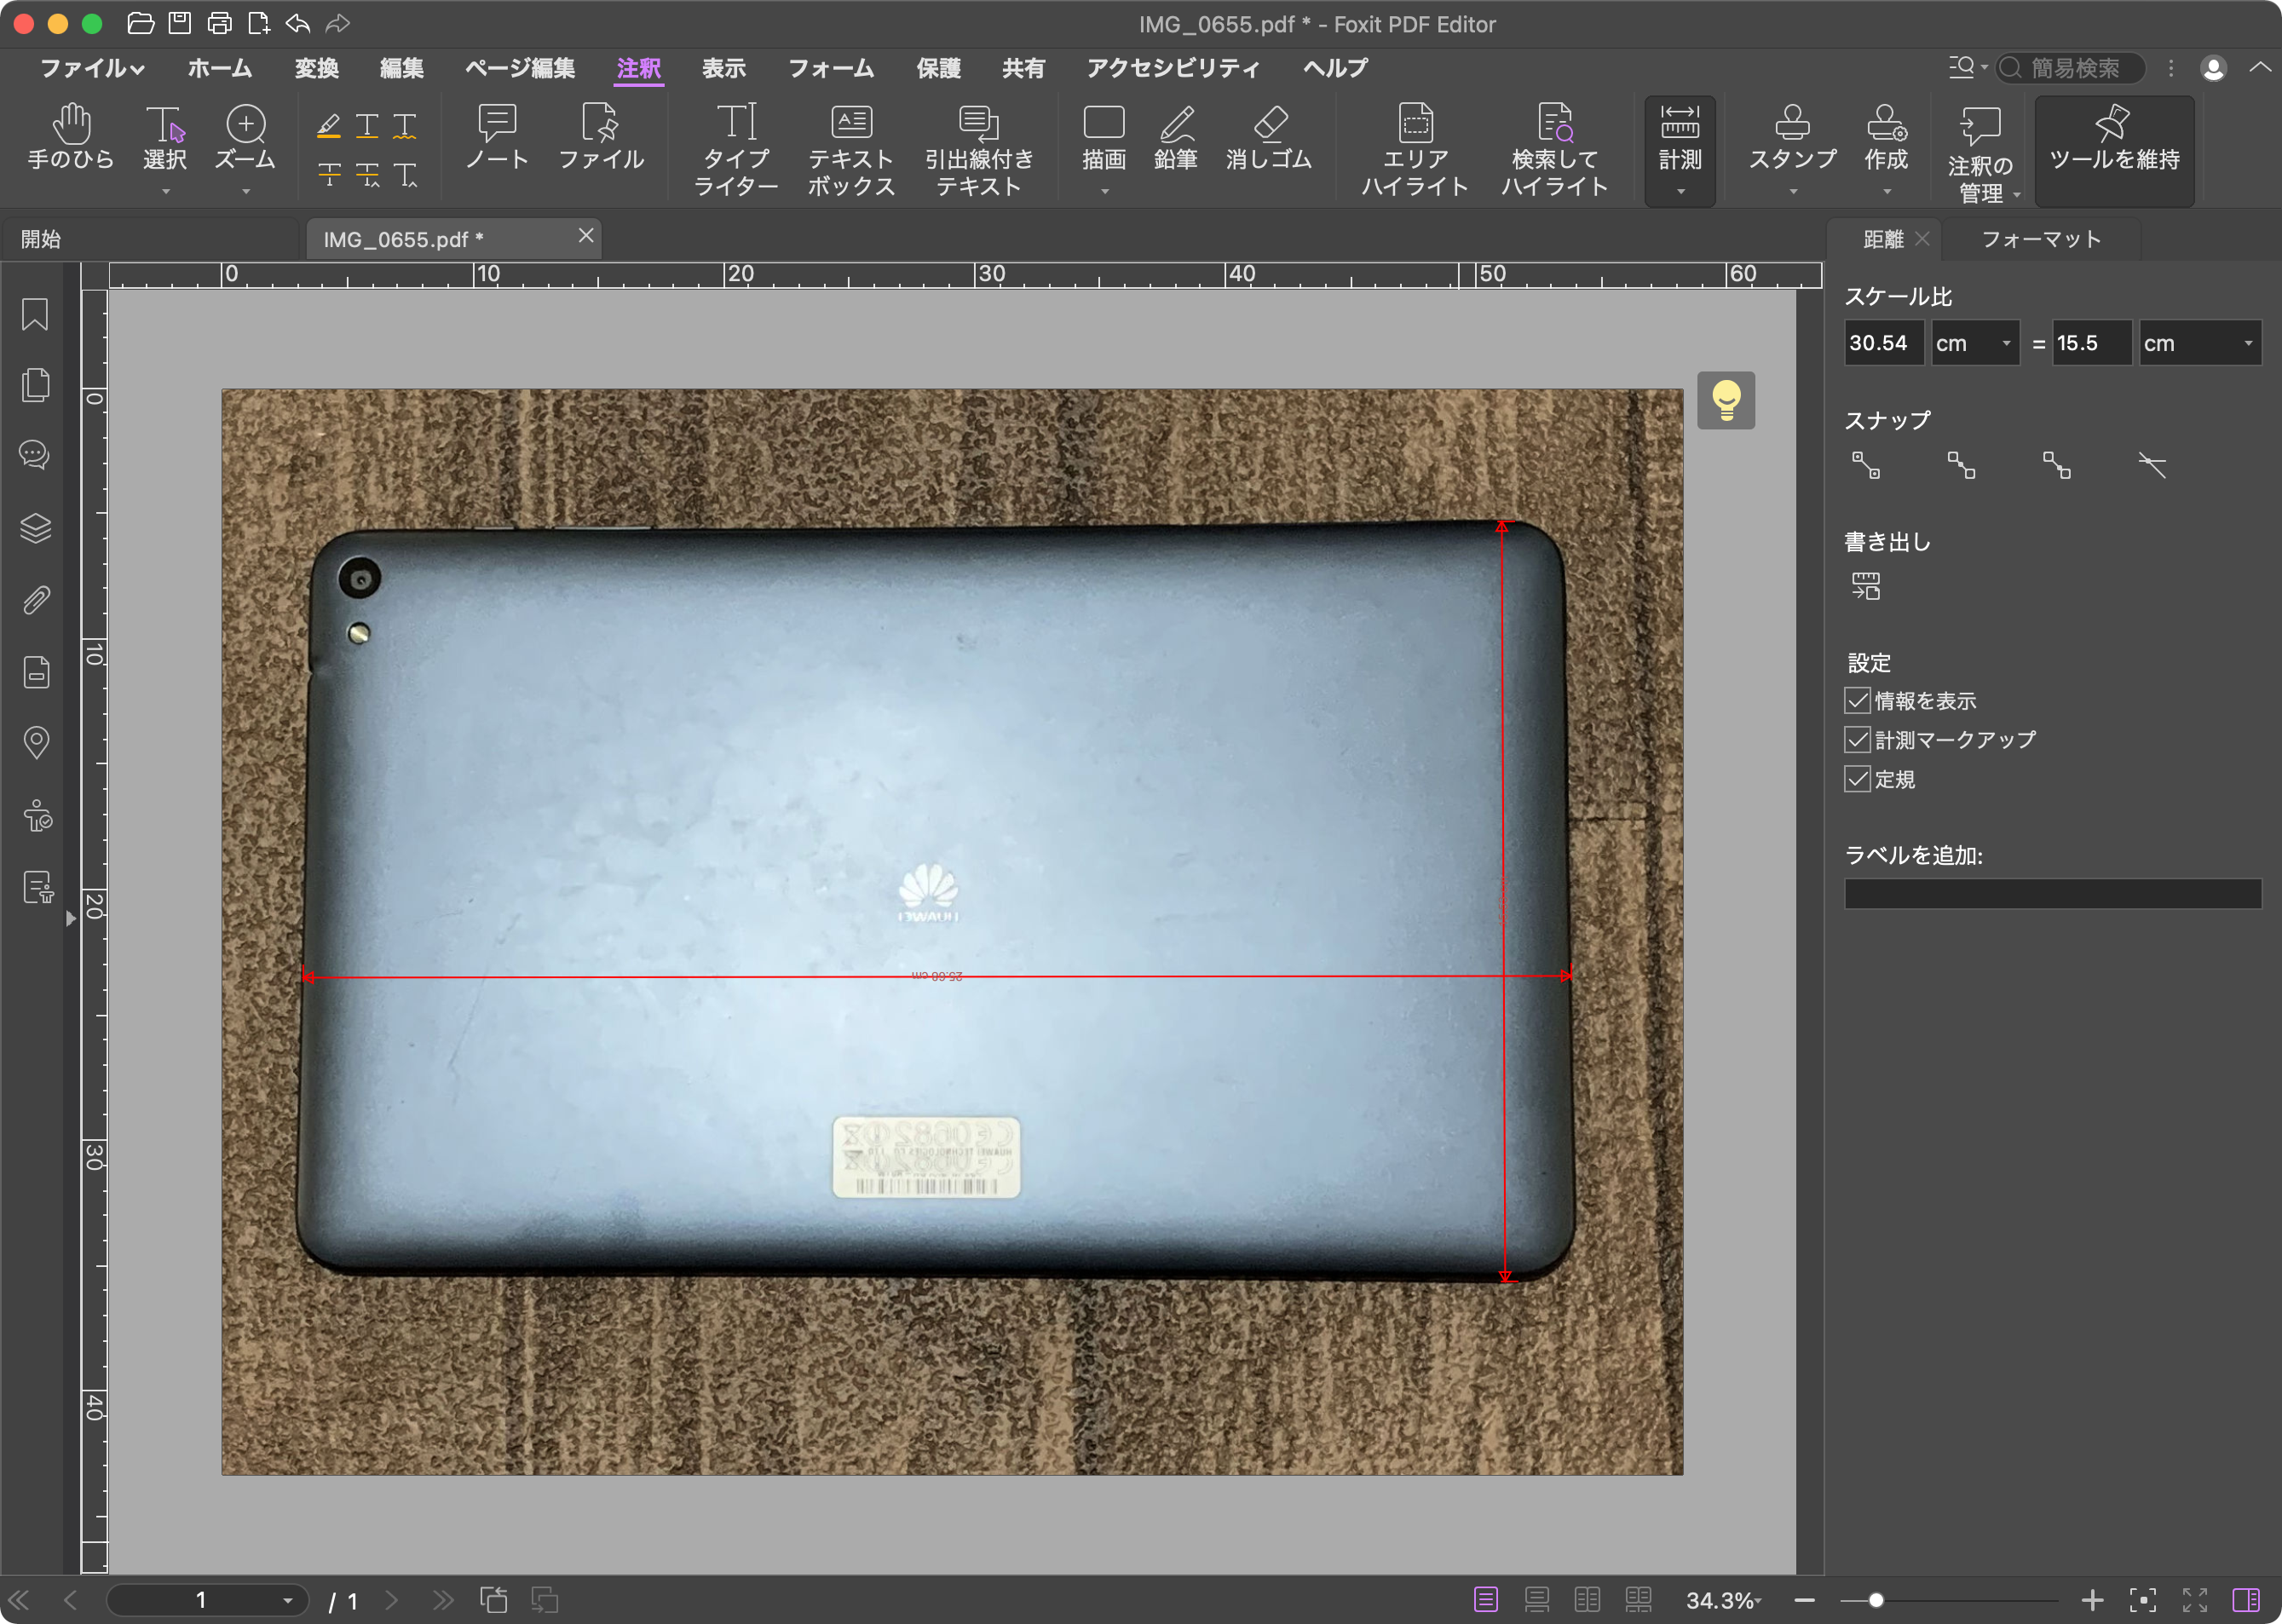 Foxit PDF Editor 計測